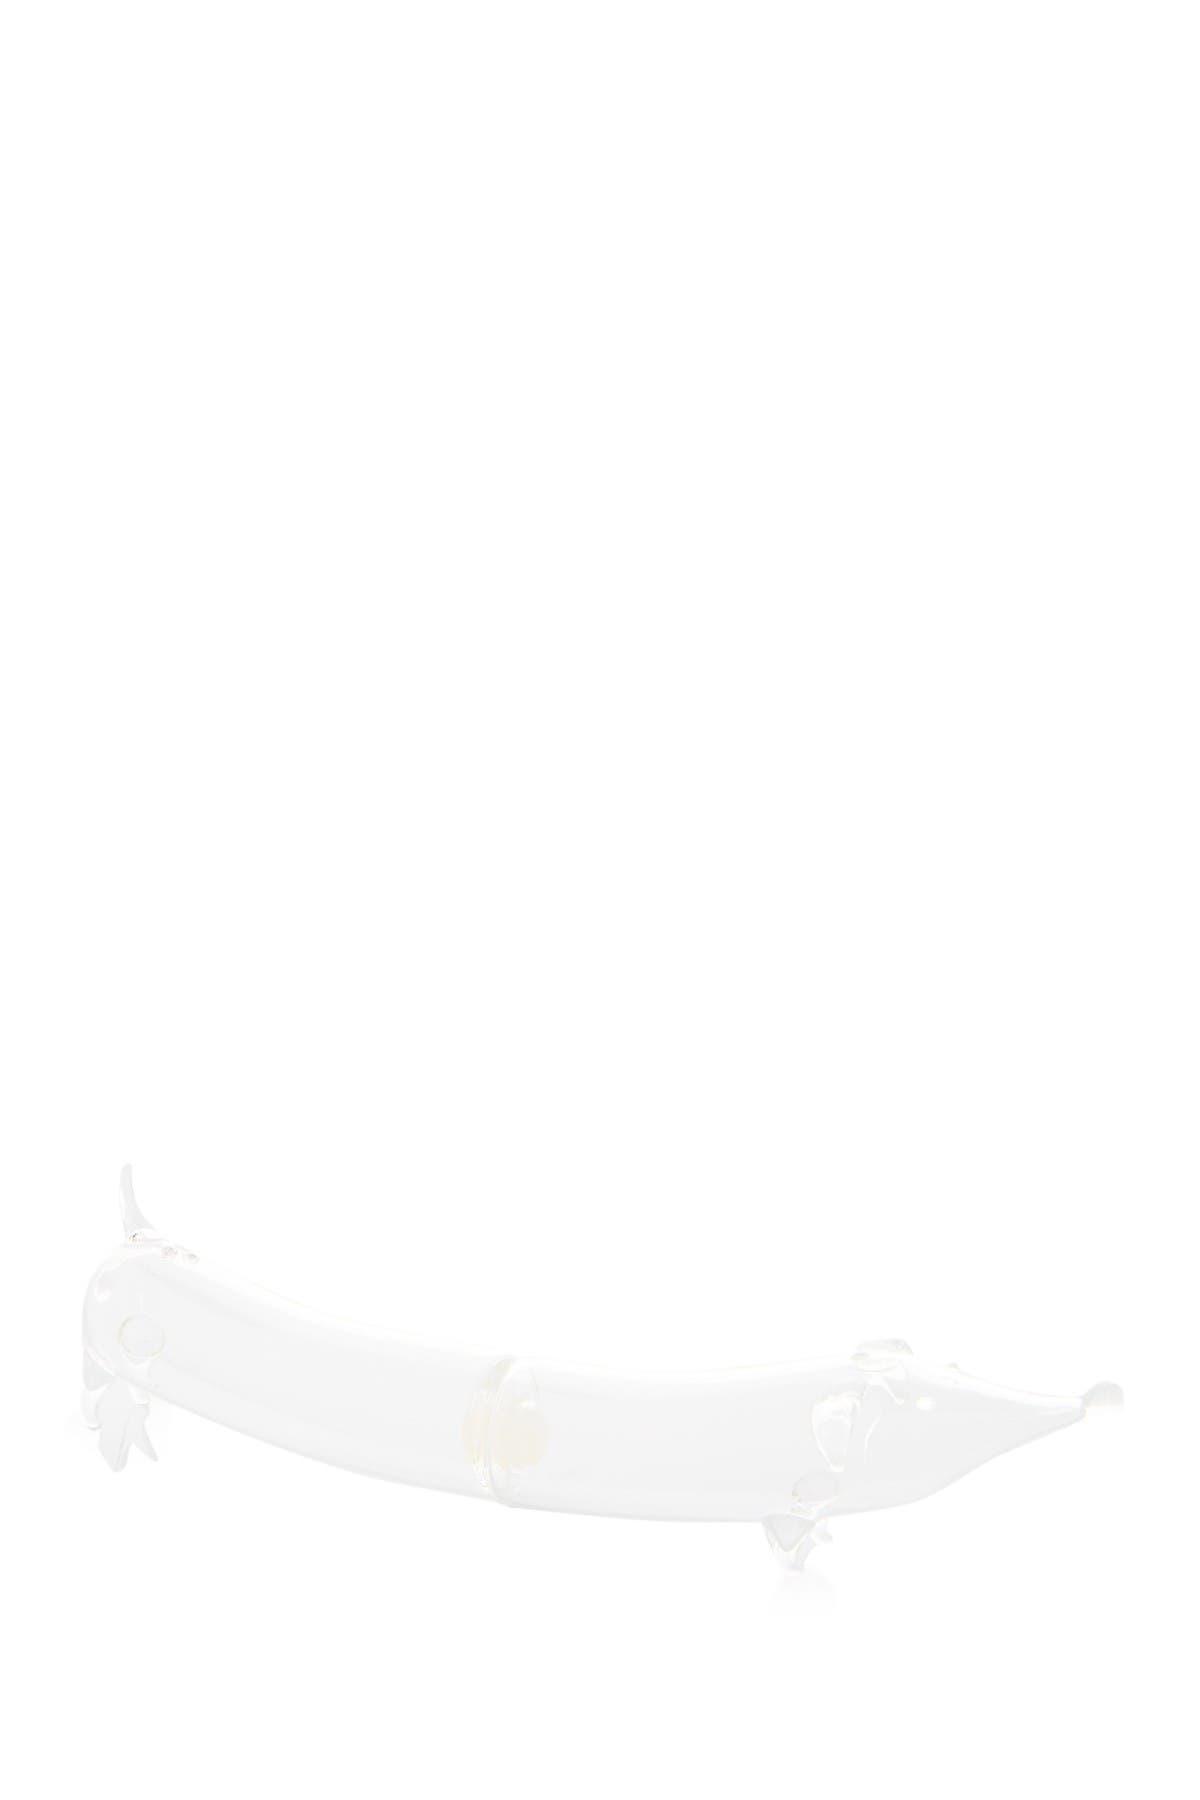 Image of ROOST Dachshund 2-Piece Salt & Pepper Shaker Set